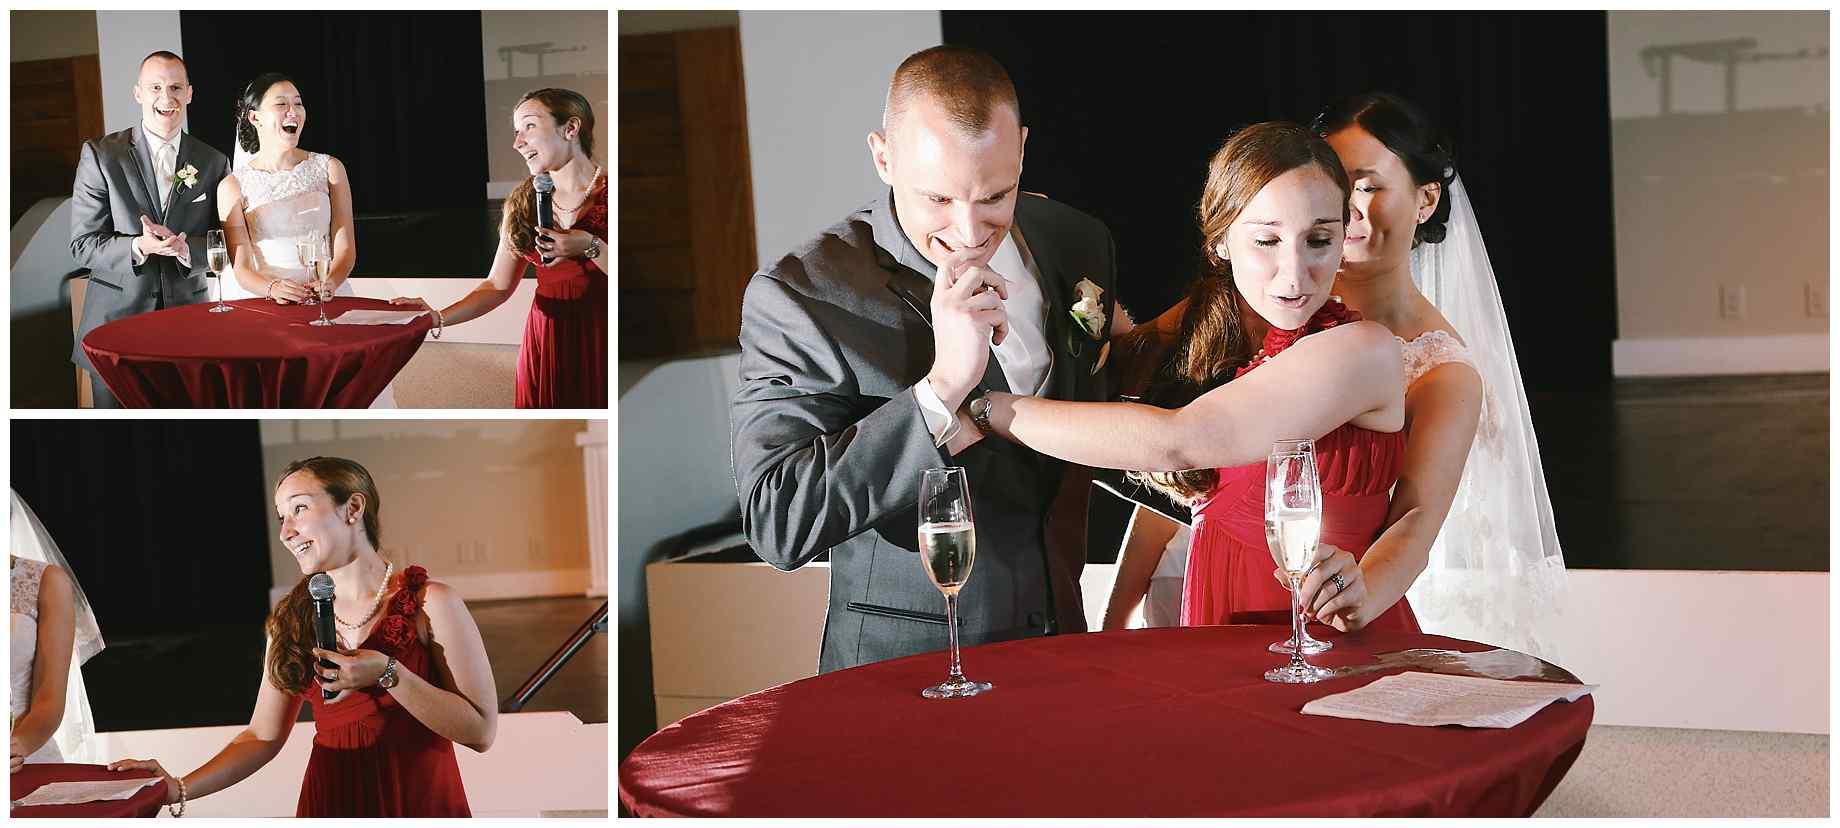 harvard-wedding-photography-32